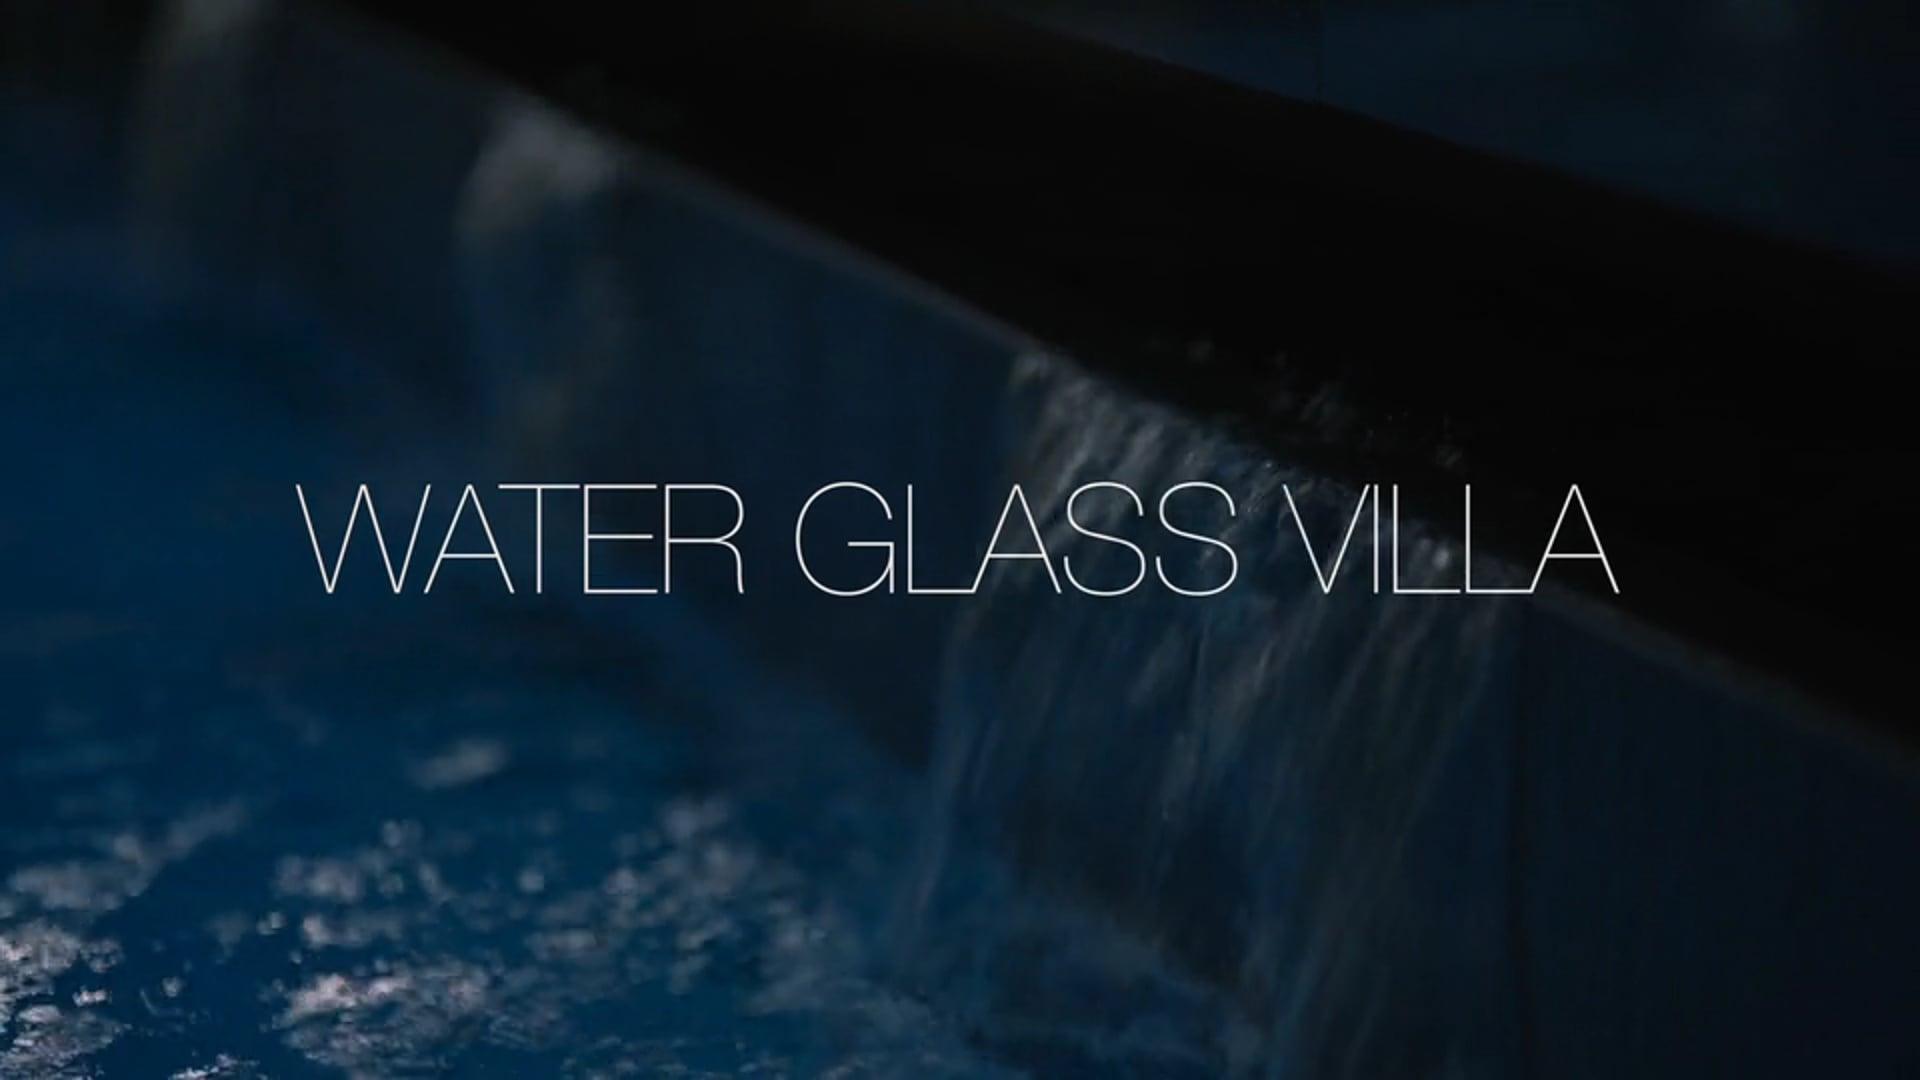 WATER GLASS VILLA